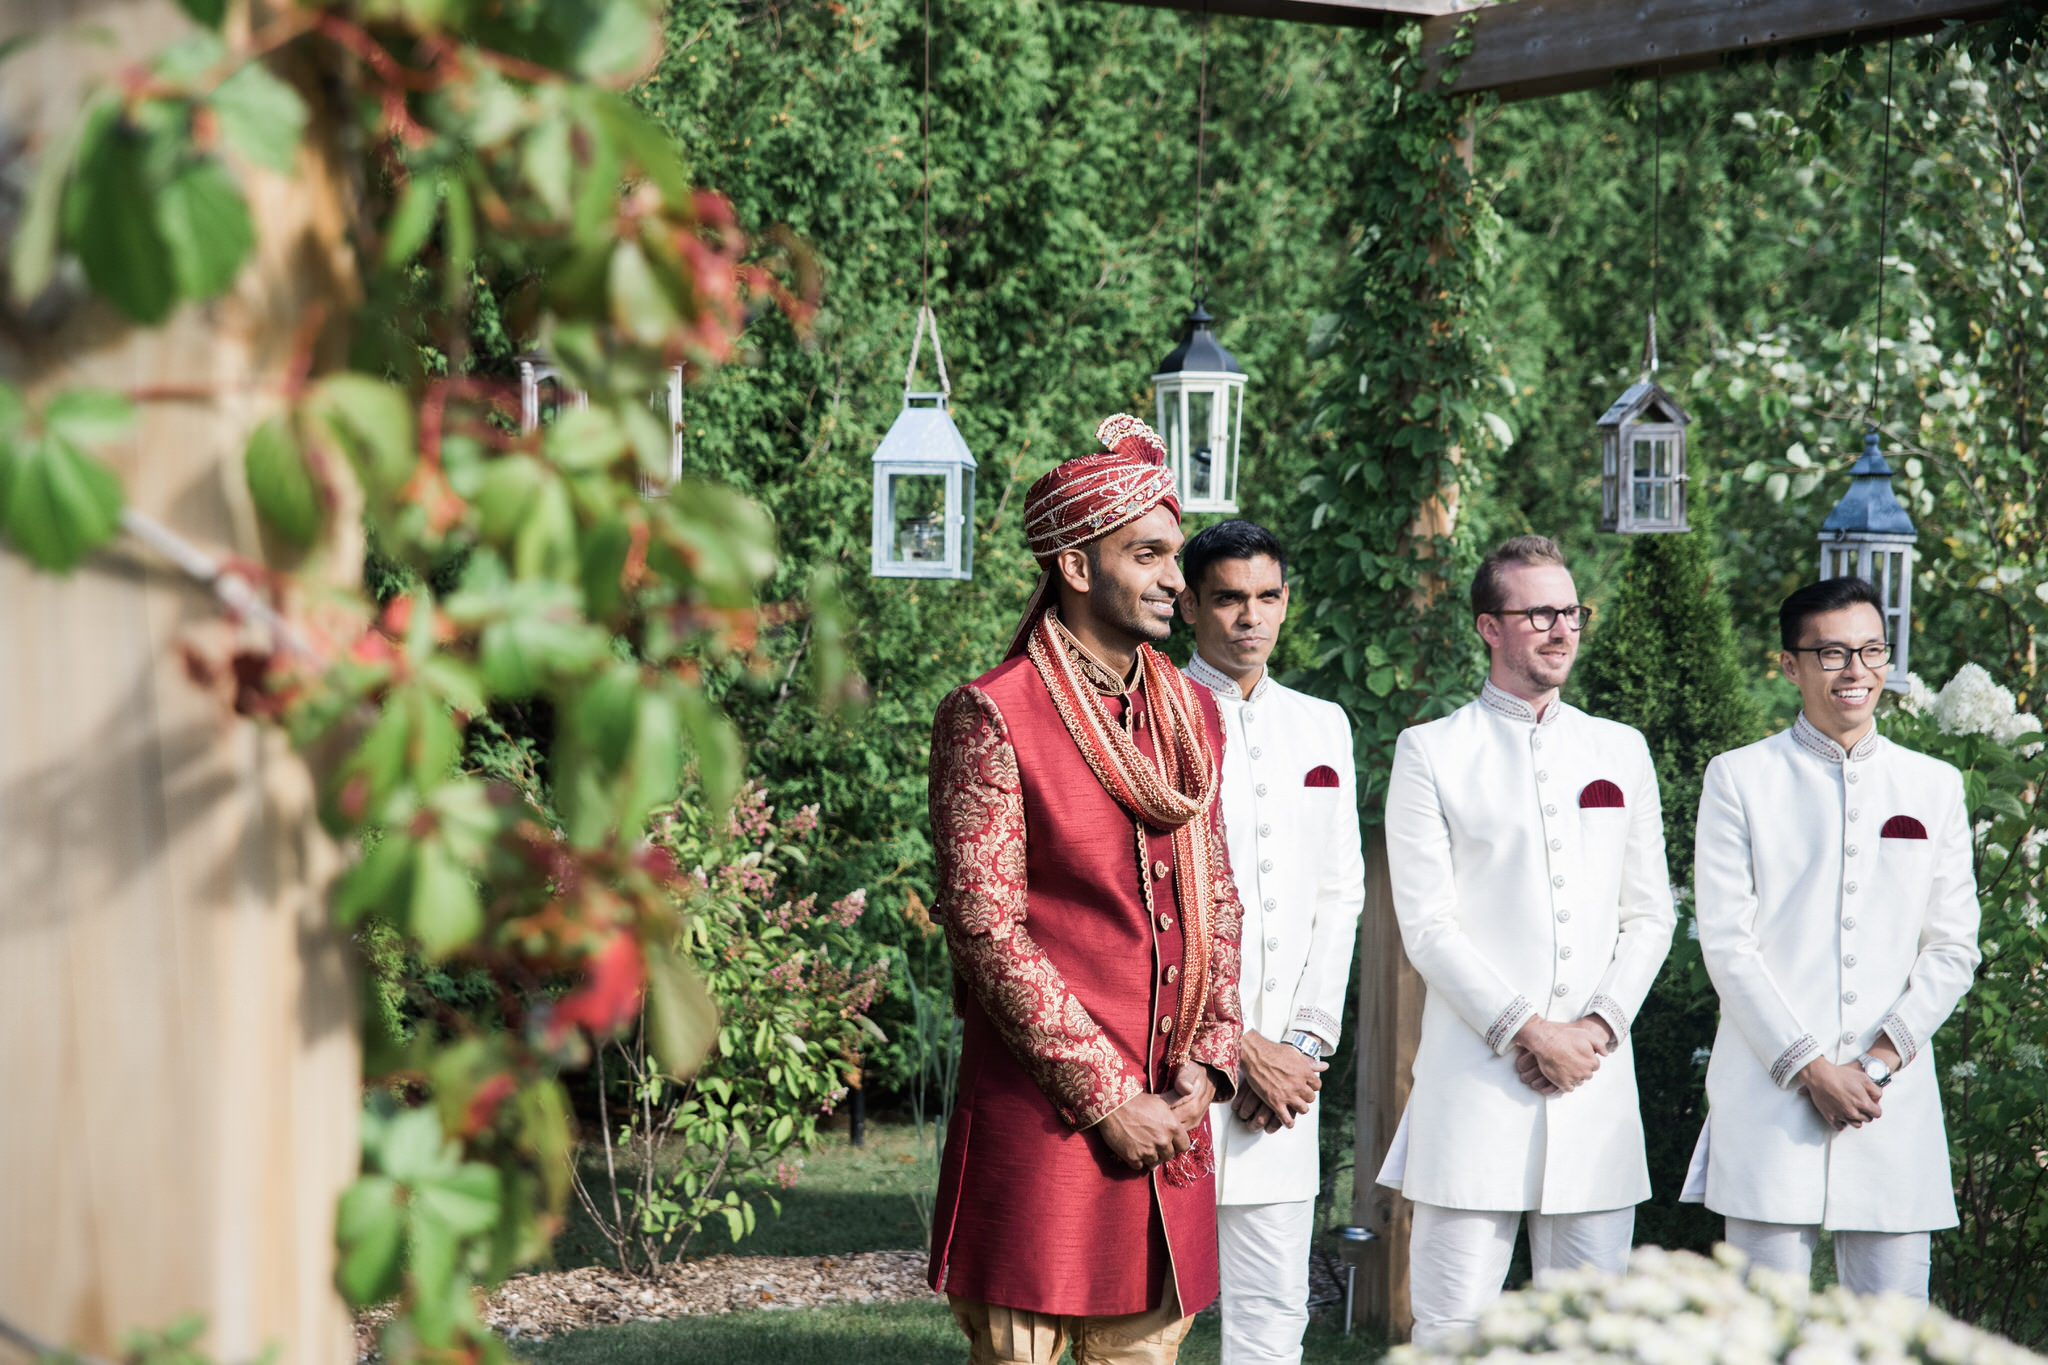 Northview Gardens Wedding - first look